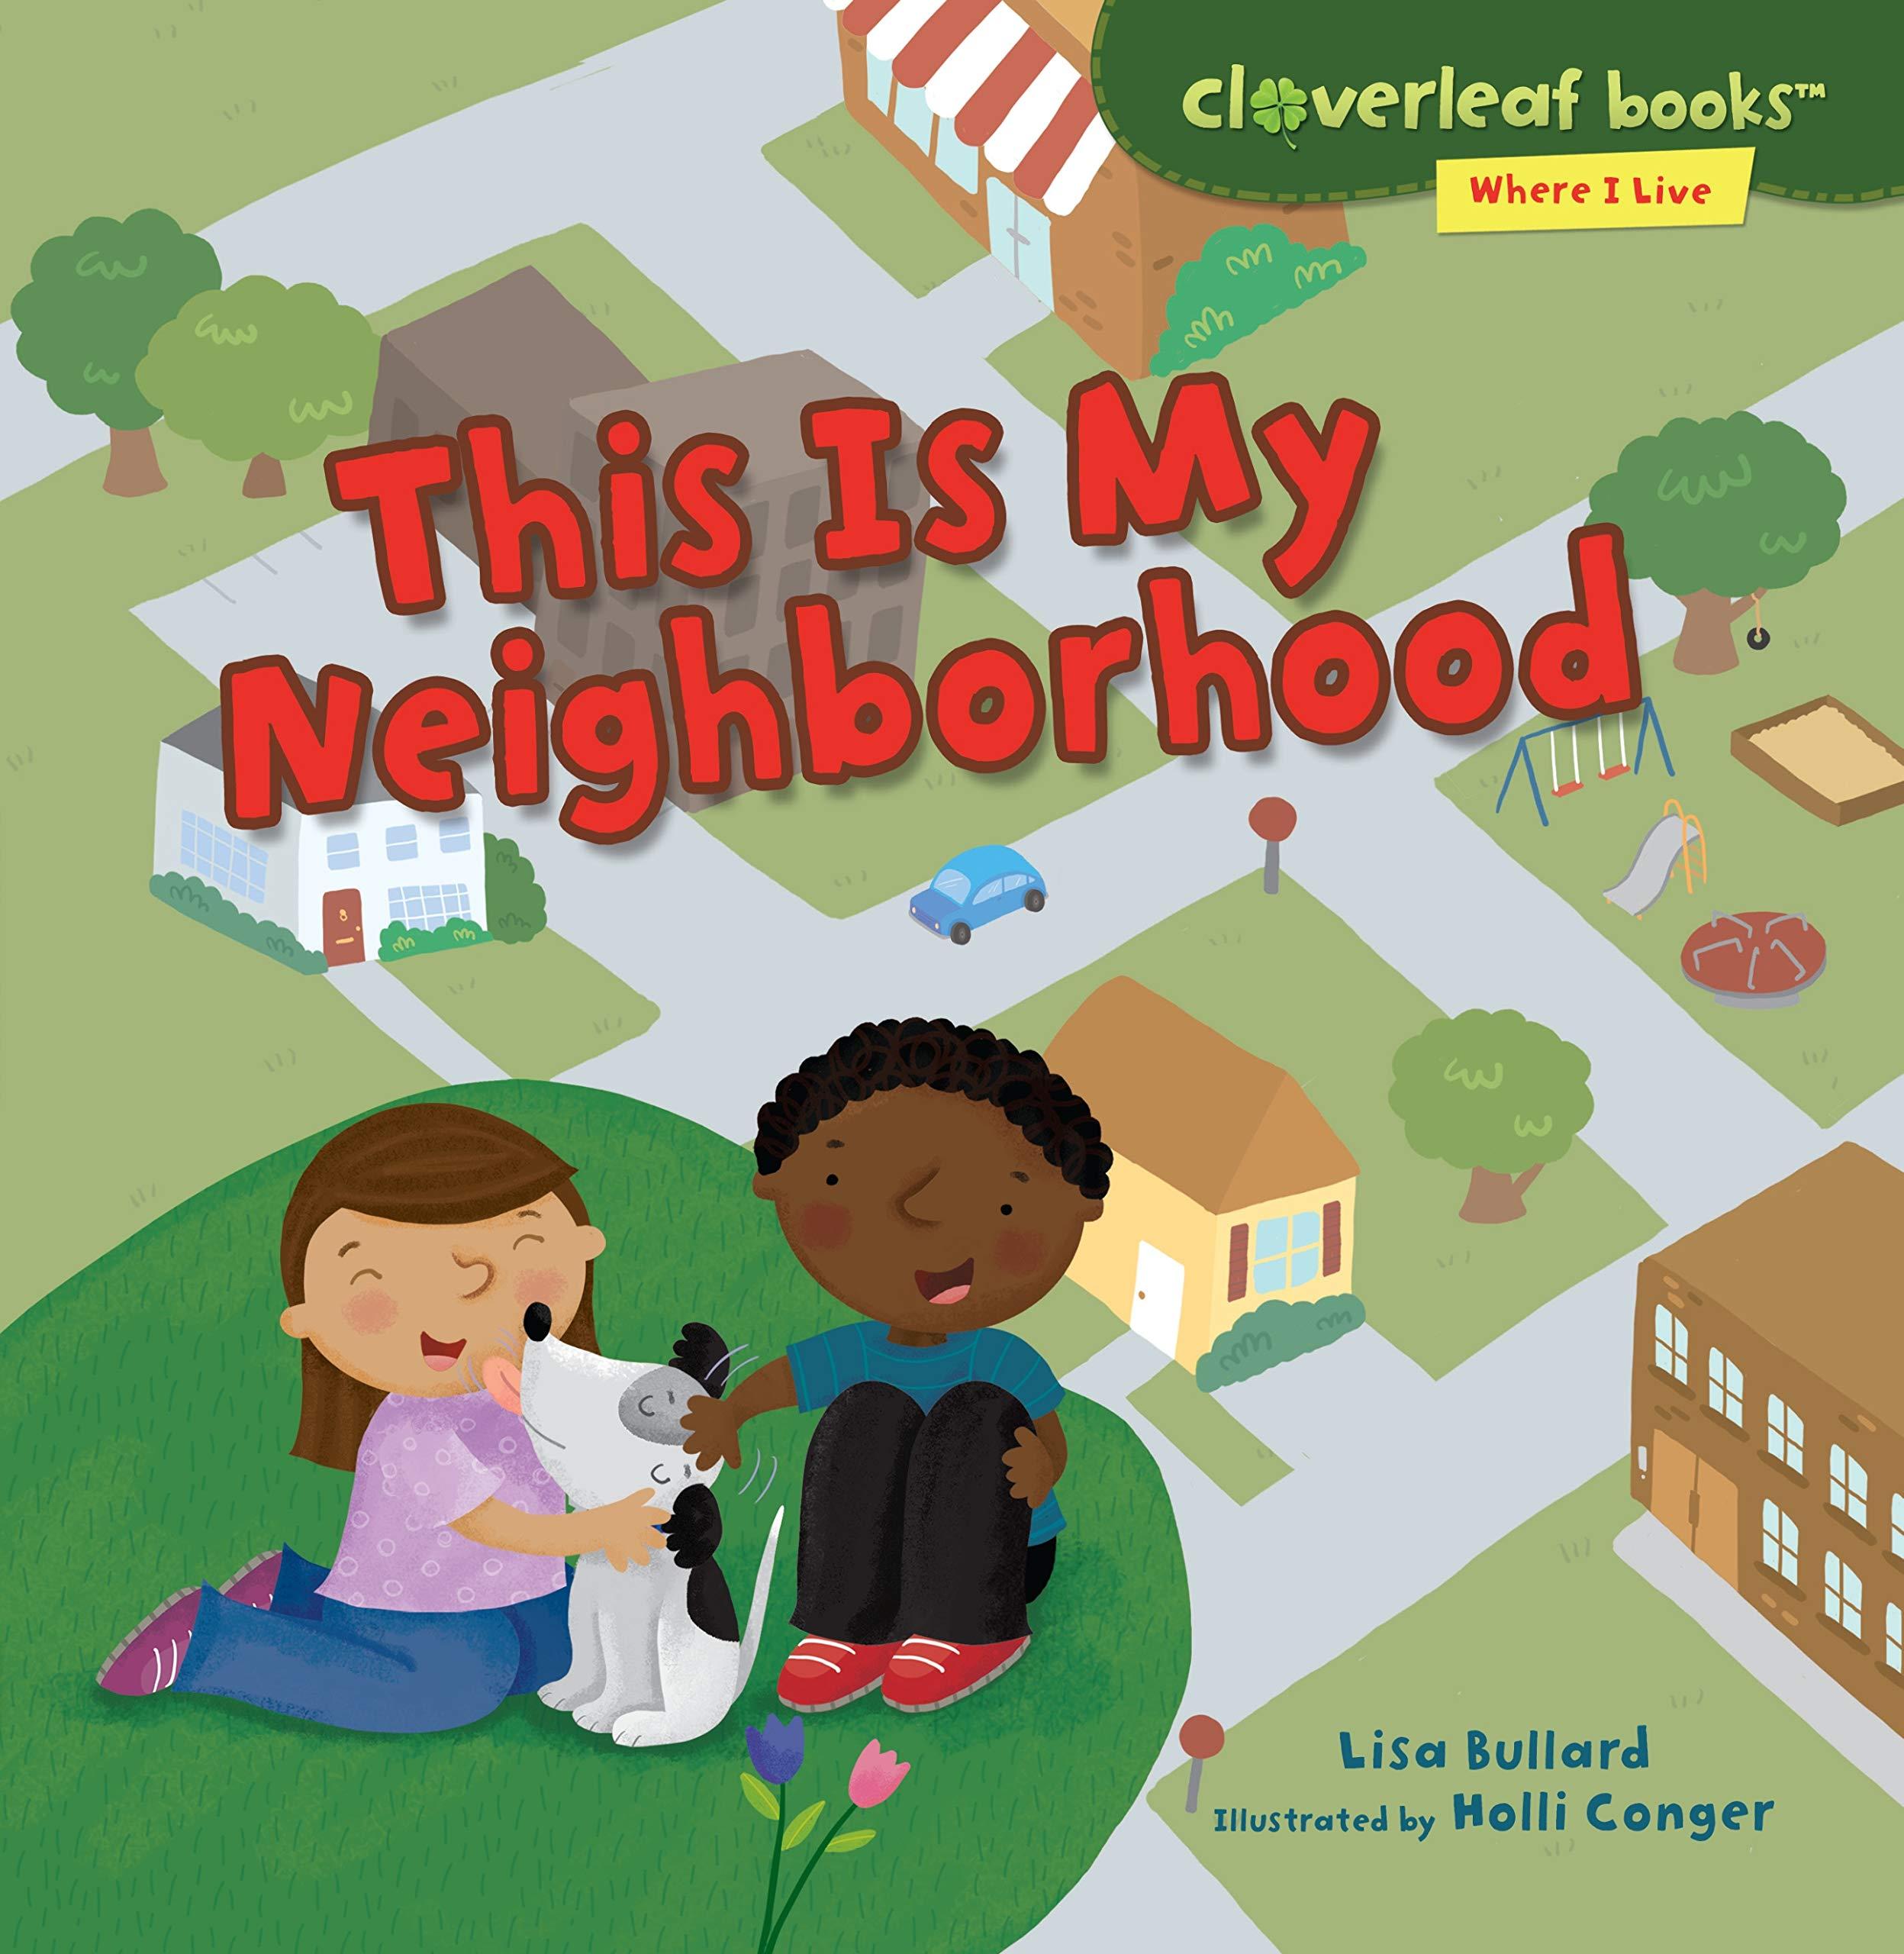 This Is My Neighborhood Cloverleaf Books Tm Where I Live Bullard Lisa Conger Holli 9781467797375 Amazon Com Books Buy a cheap copy of where do i live? this is my neighborhood cloverleaf